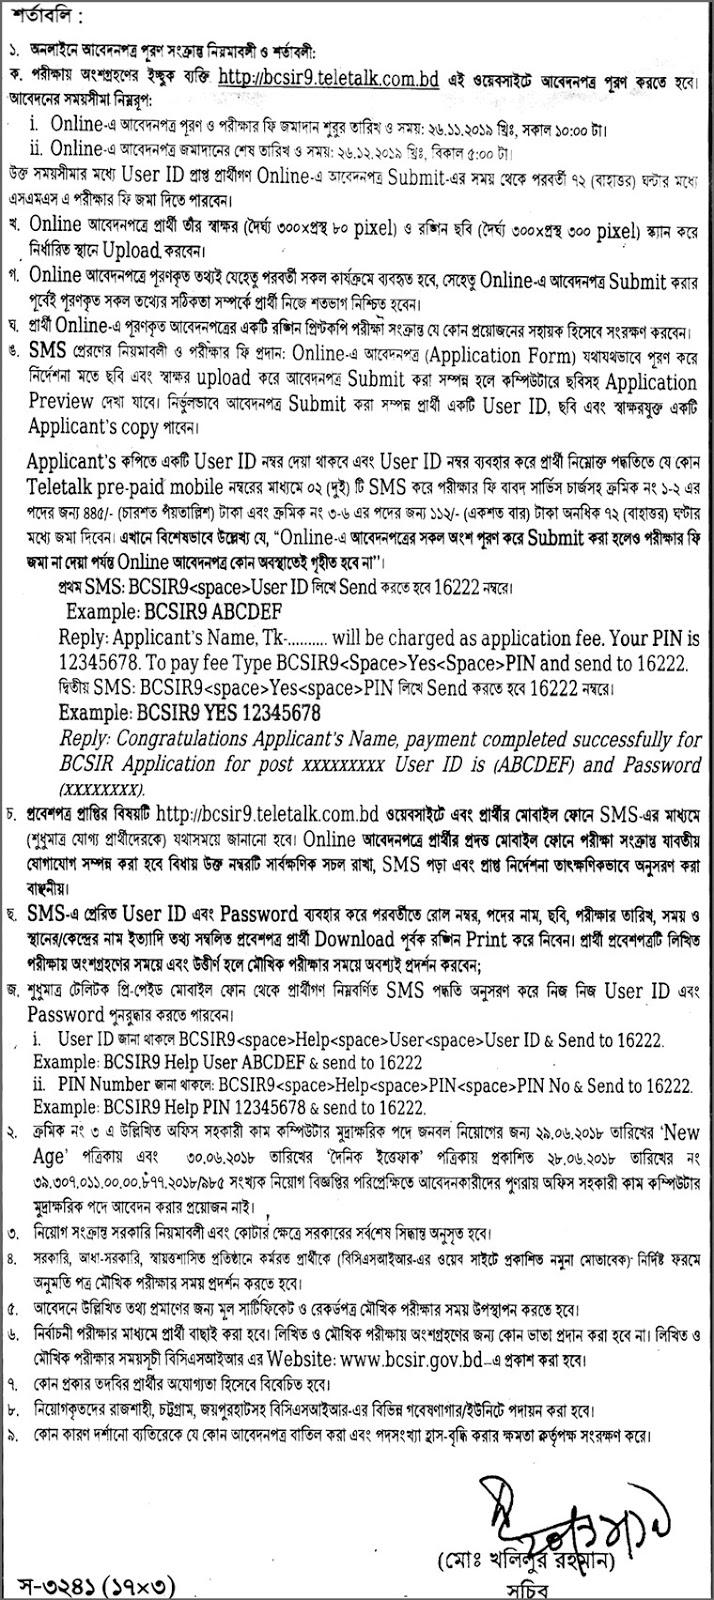 Bangladesh Council of Scientific and Industrial Research (BCSIR) Job Circular 2019